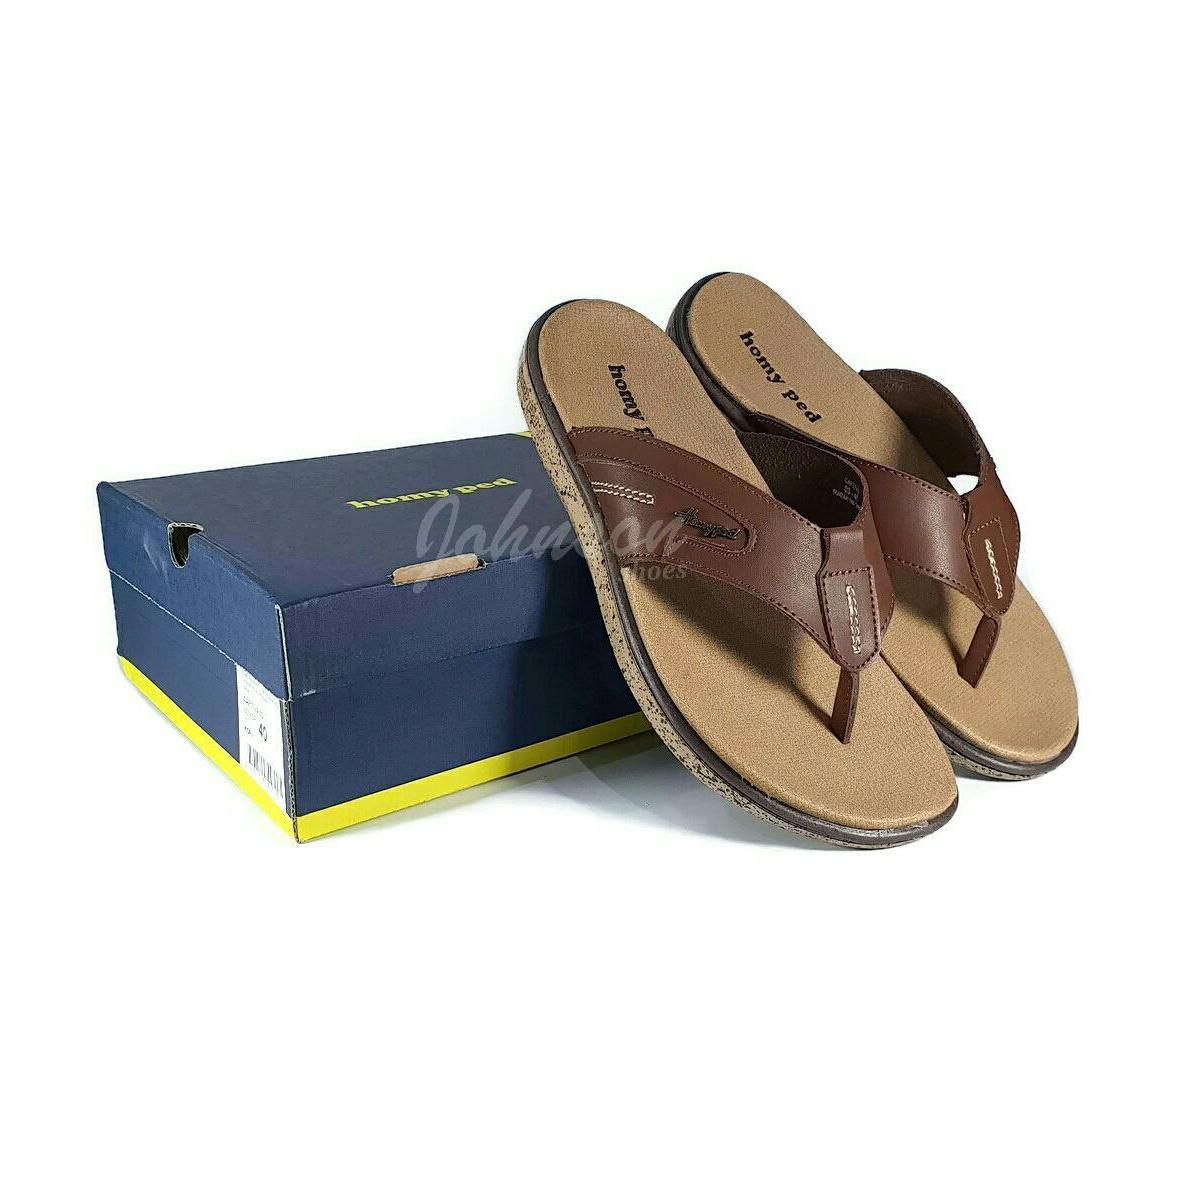 Johnson Shoes Sandal Sendal Pria Homyped Captiva 03 Original